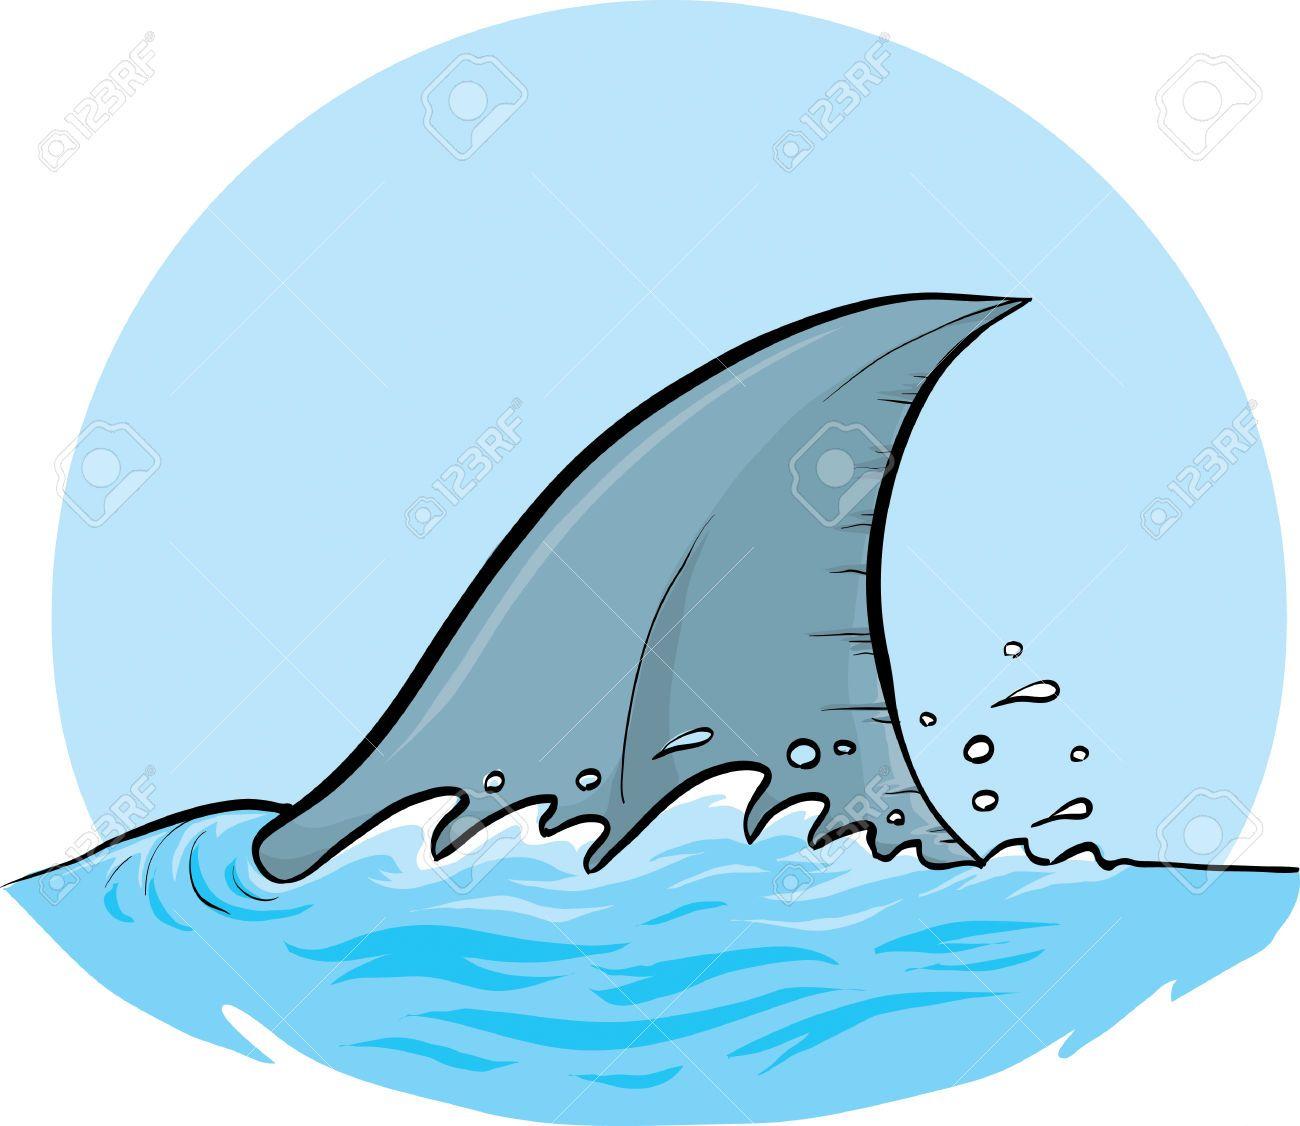 Fdd1d769ac9c7dc6e161d8aaceeabaaf Jpg 1300 1126 Aleta De Tiburon Dibujo De Tiburon Dibujos